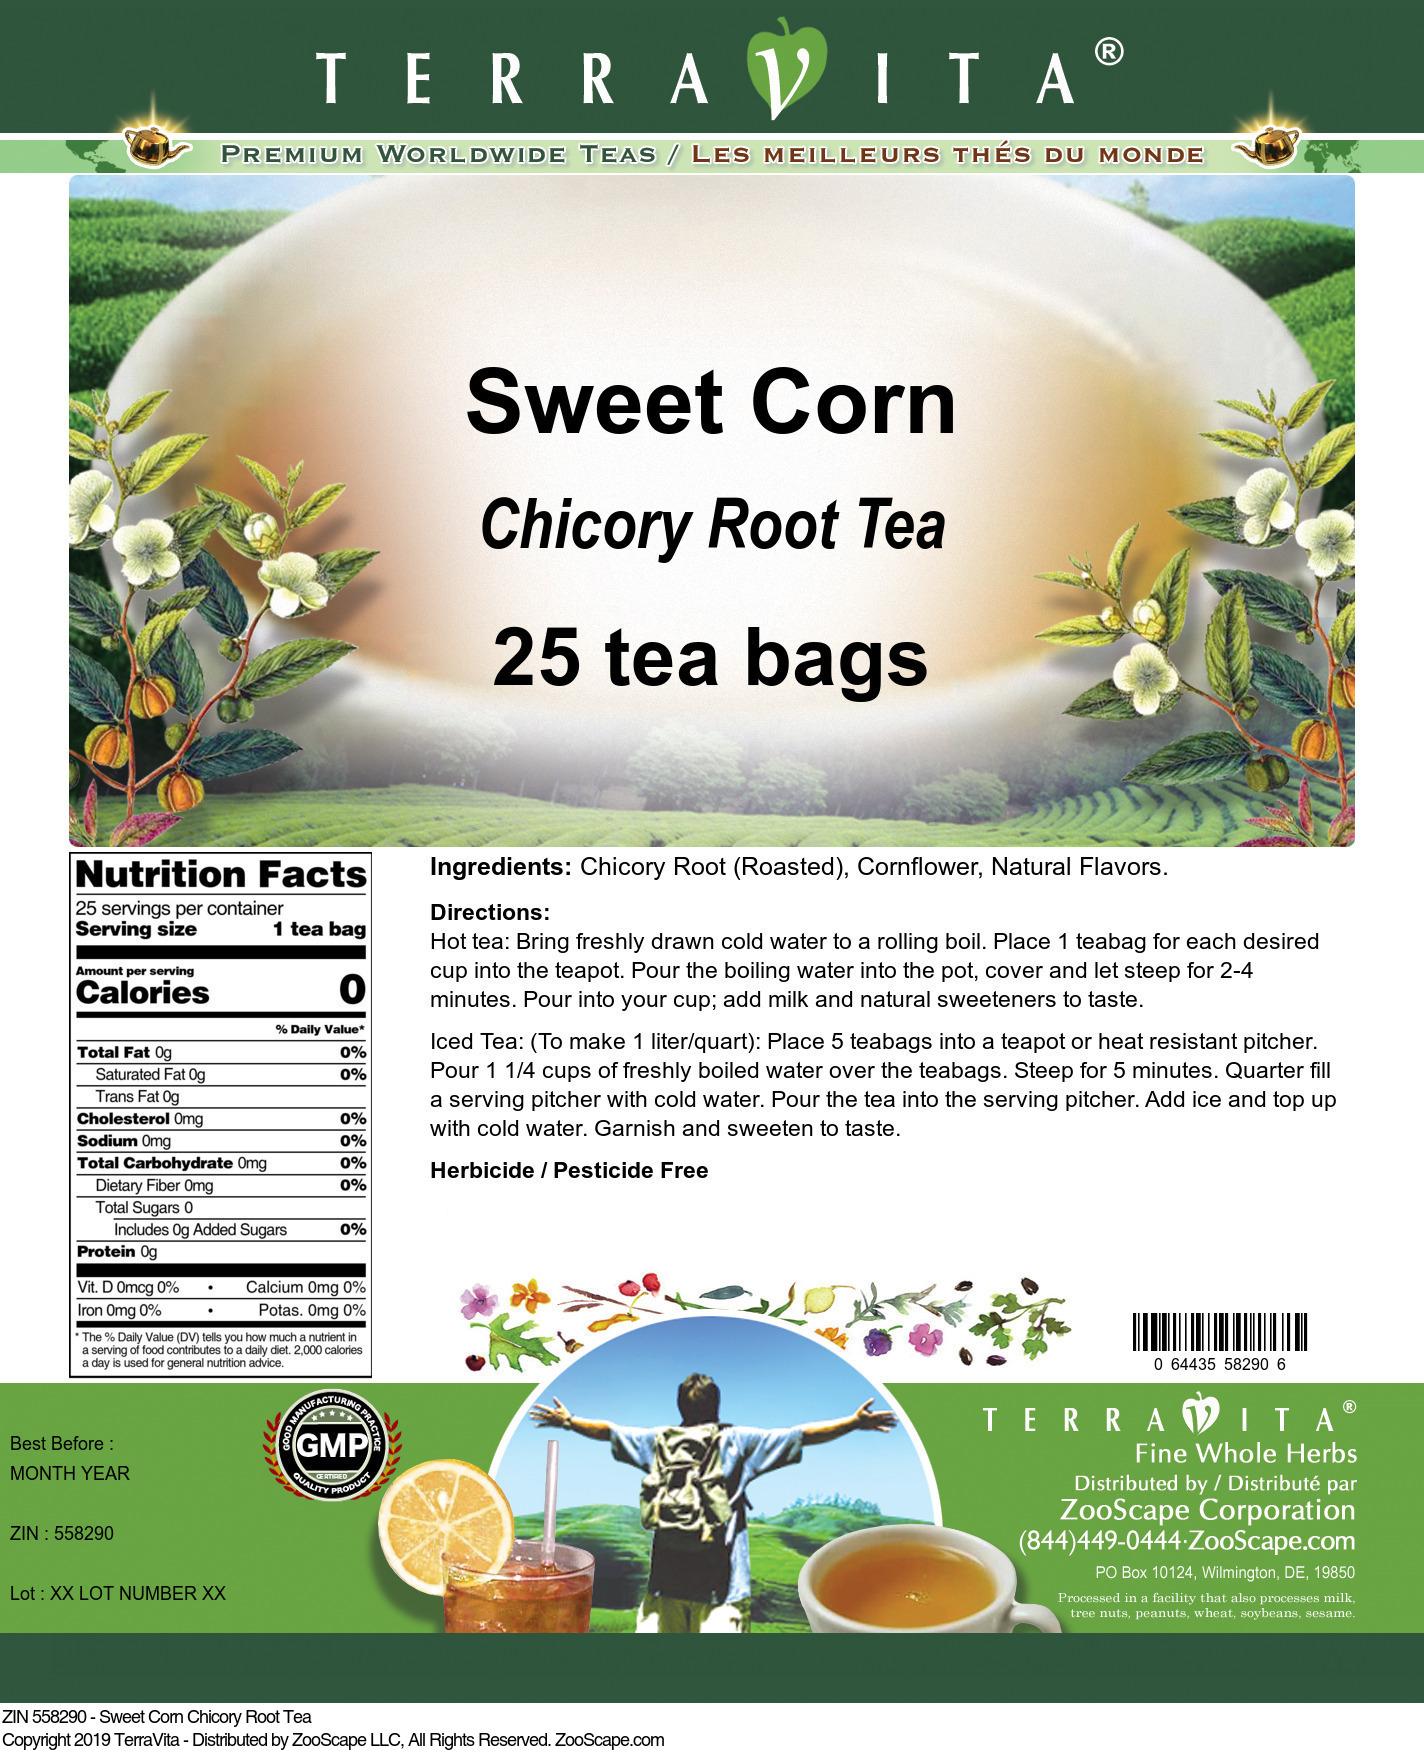 Sweet Corn Chicory Root Tea